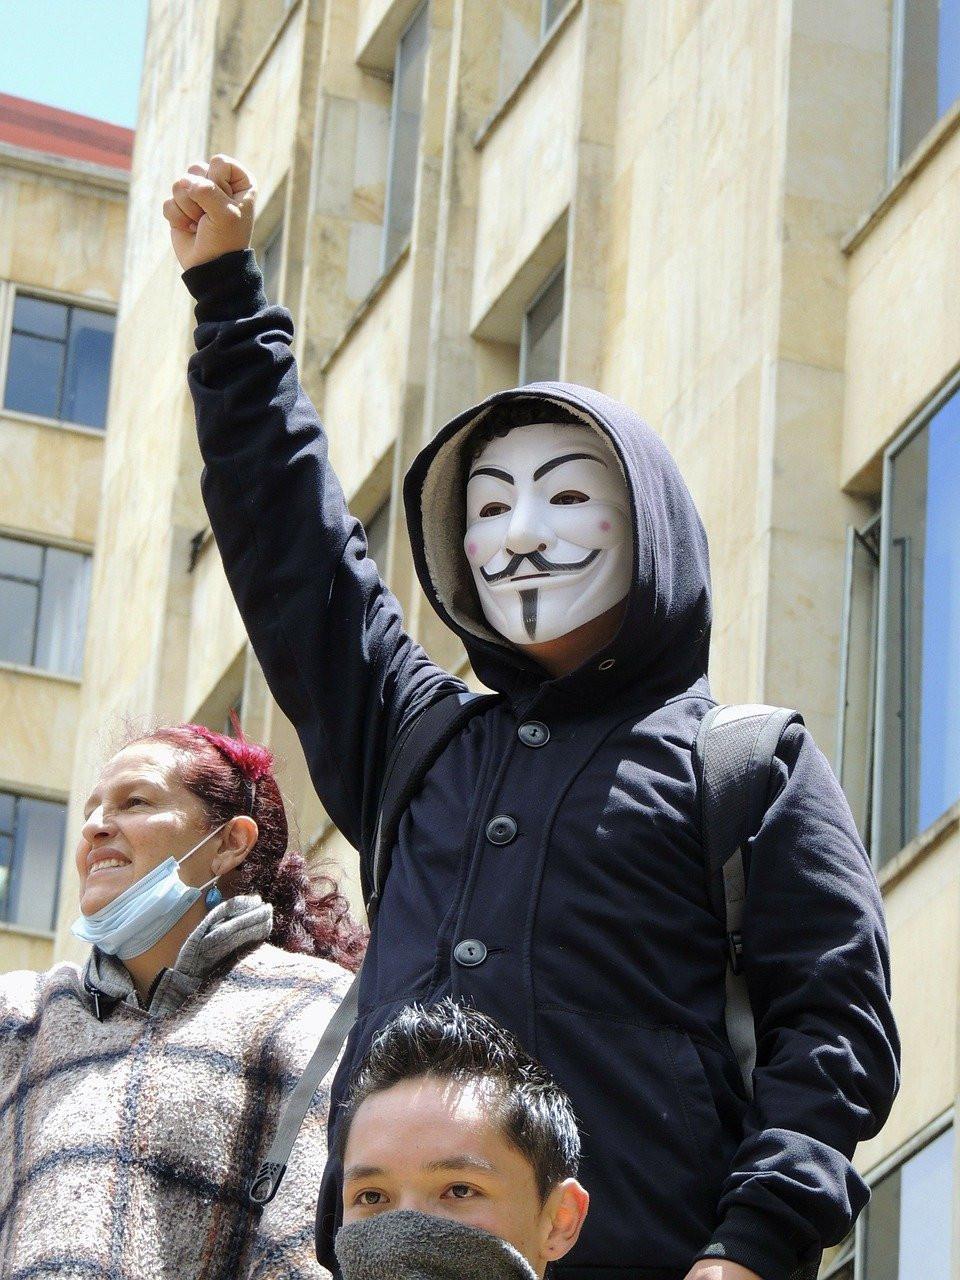 Маска Анонимуса - символ протеста